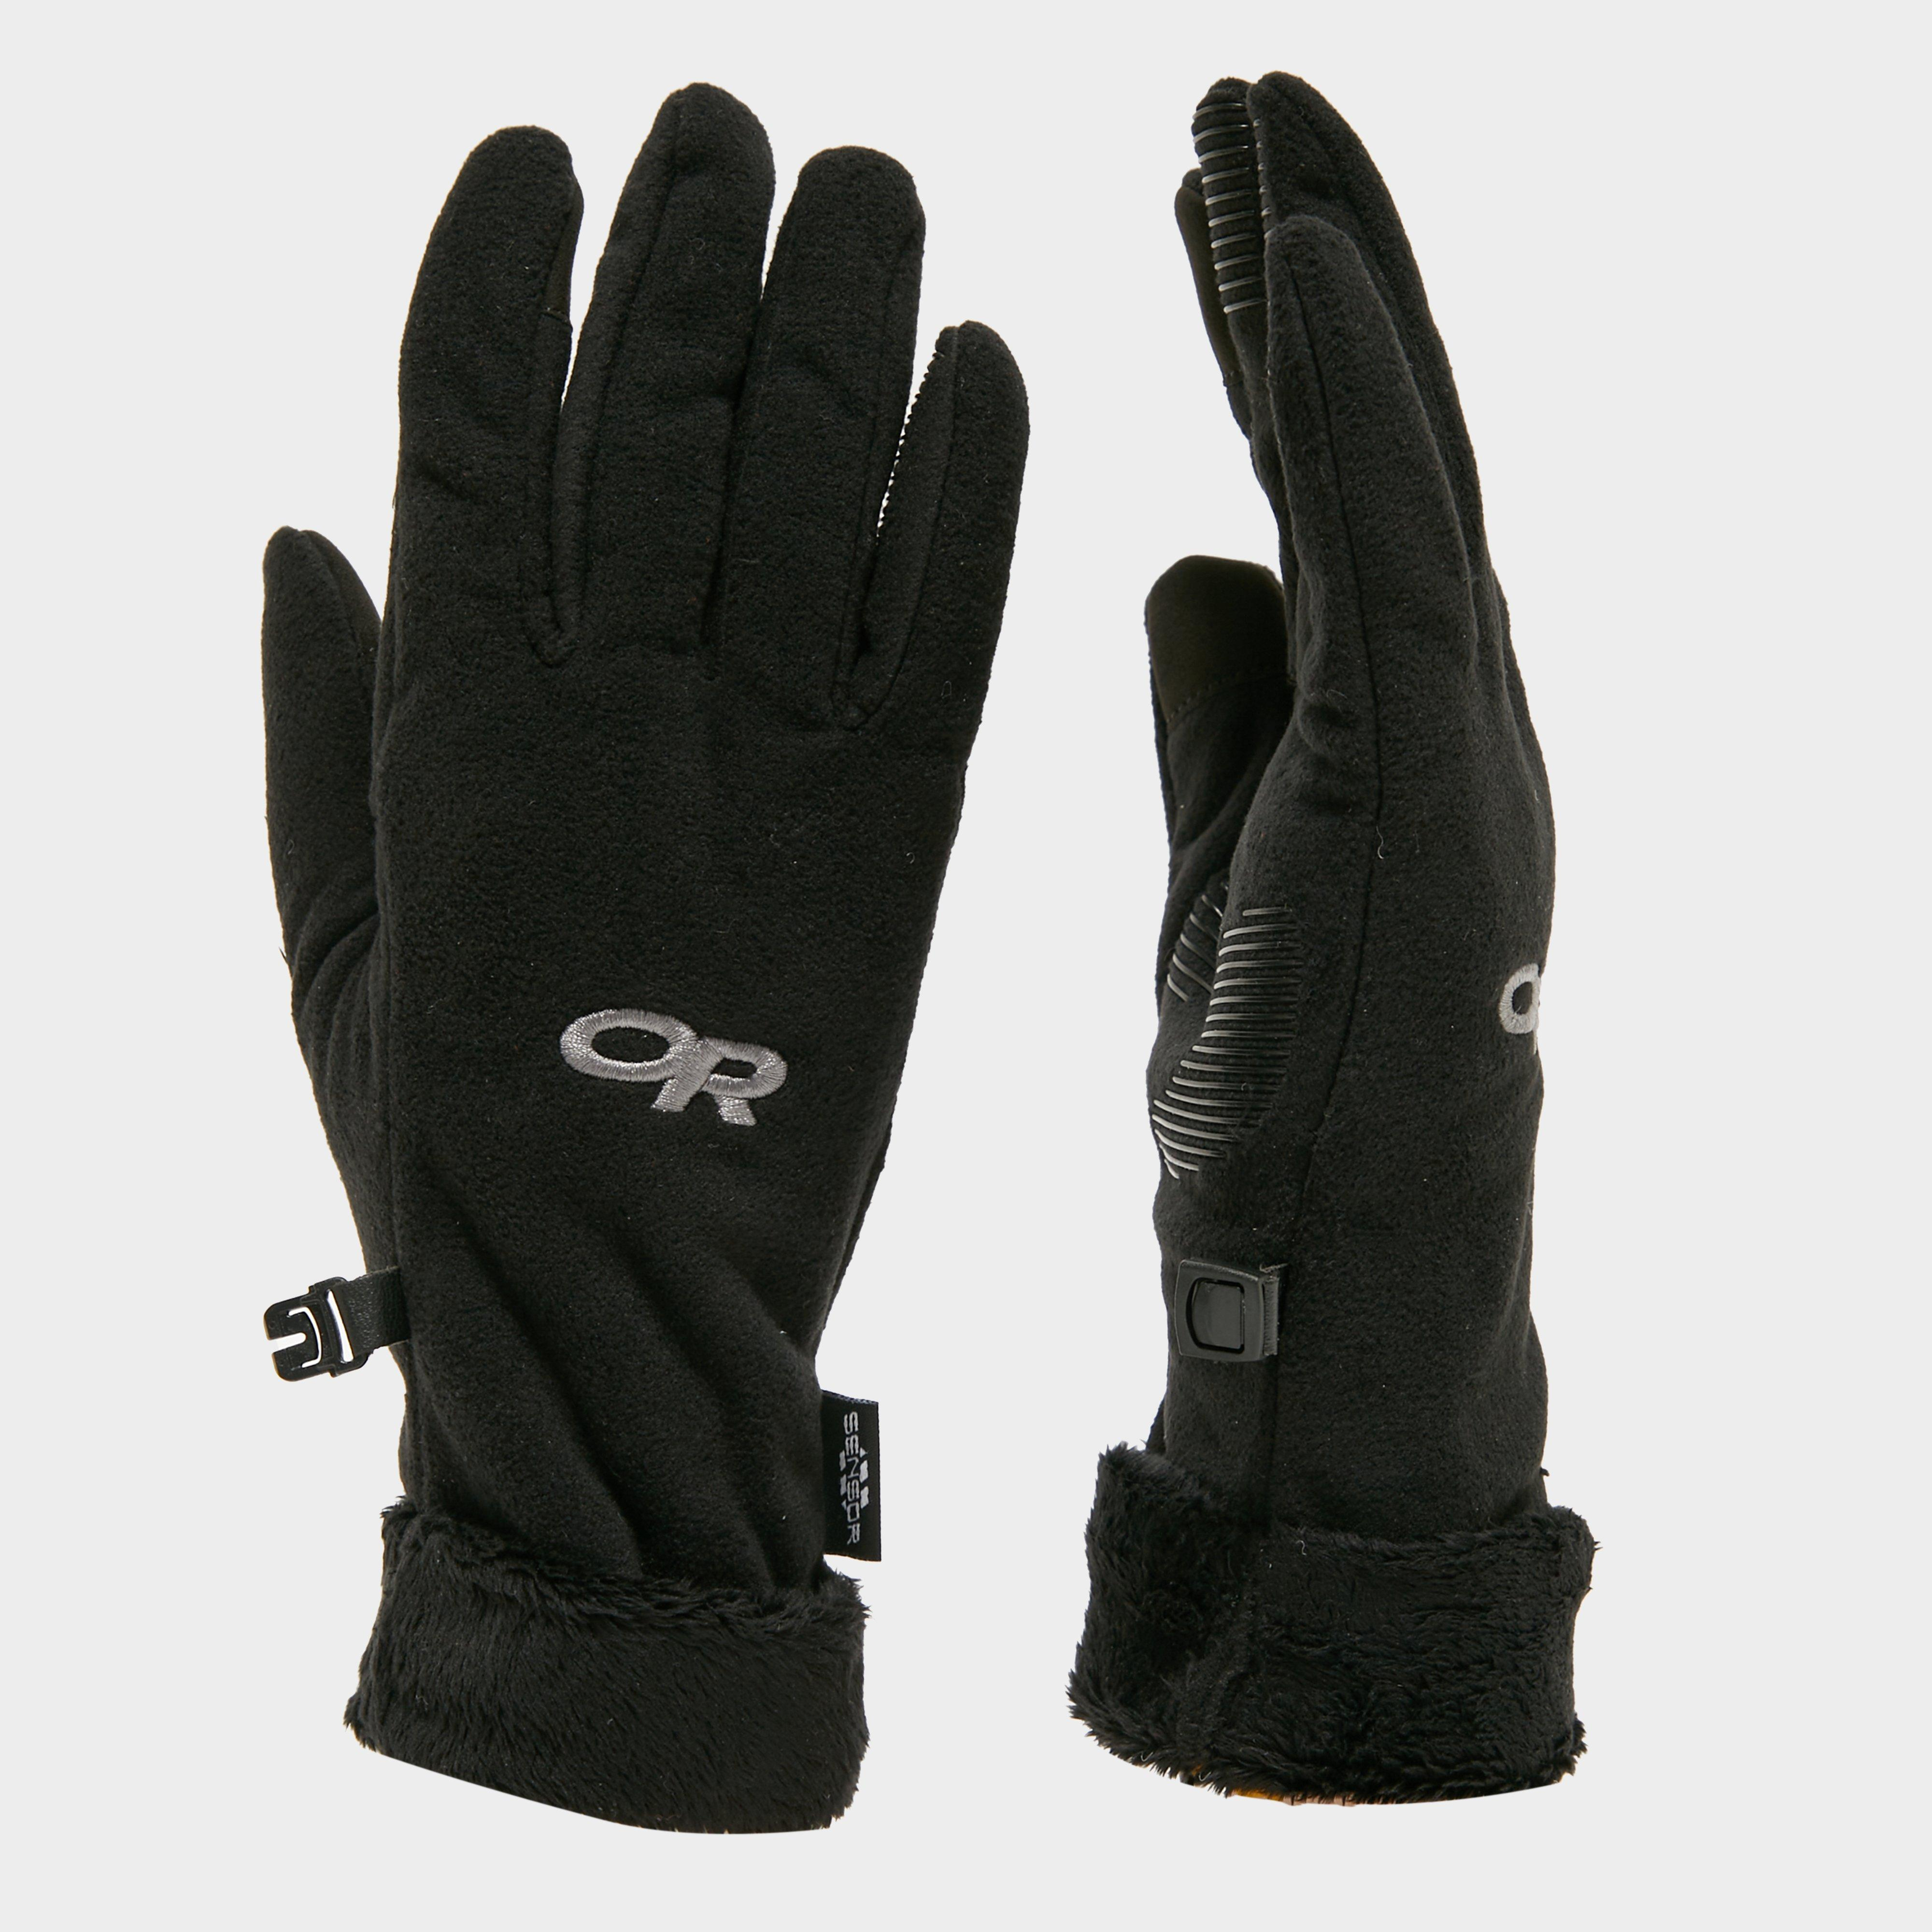 Outdoor Research Women's Fuzzy Sensor Gloves, Black